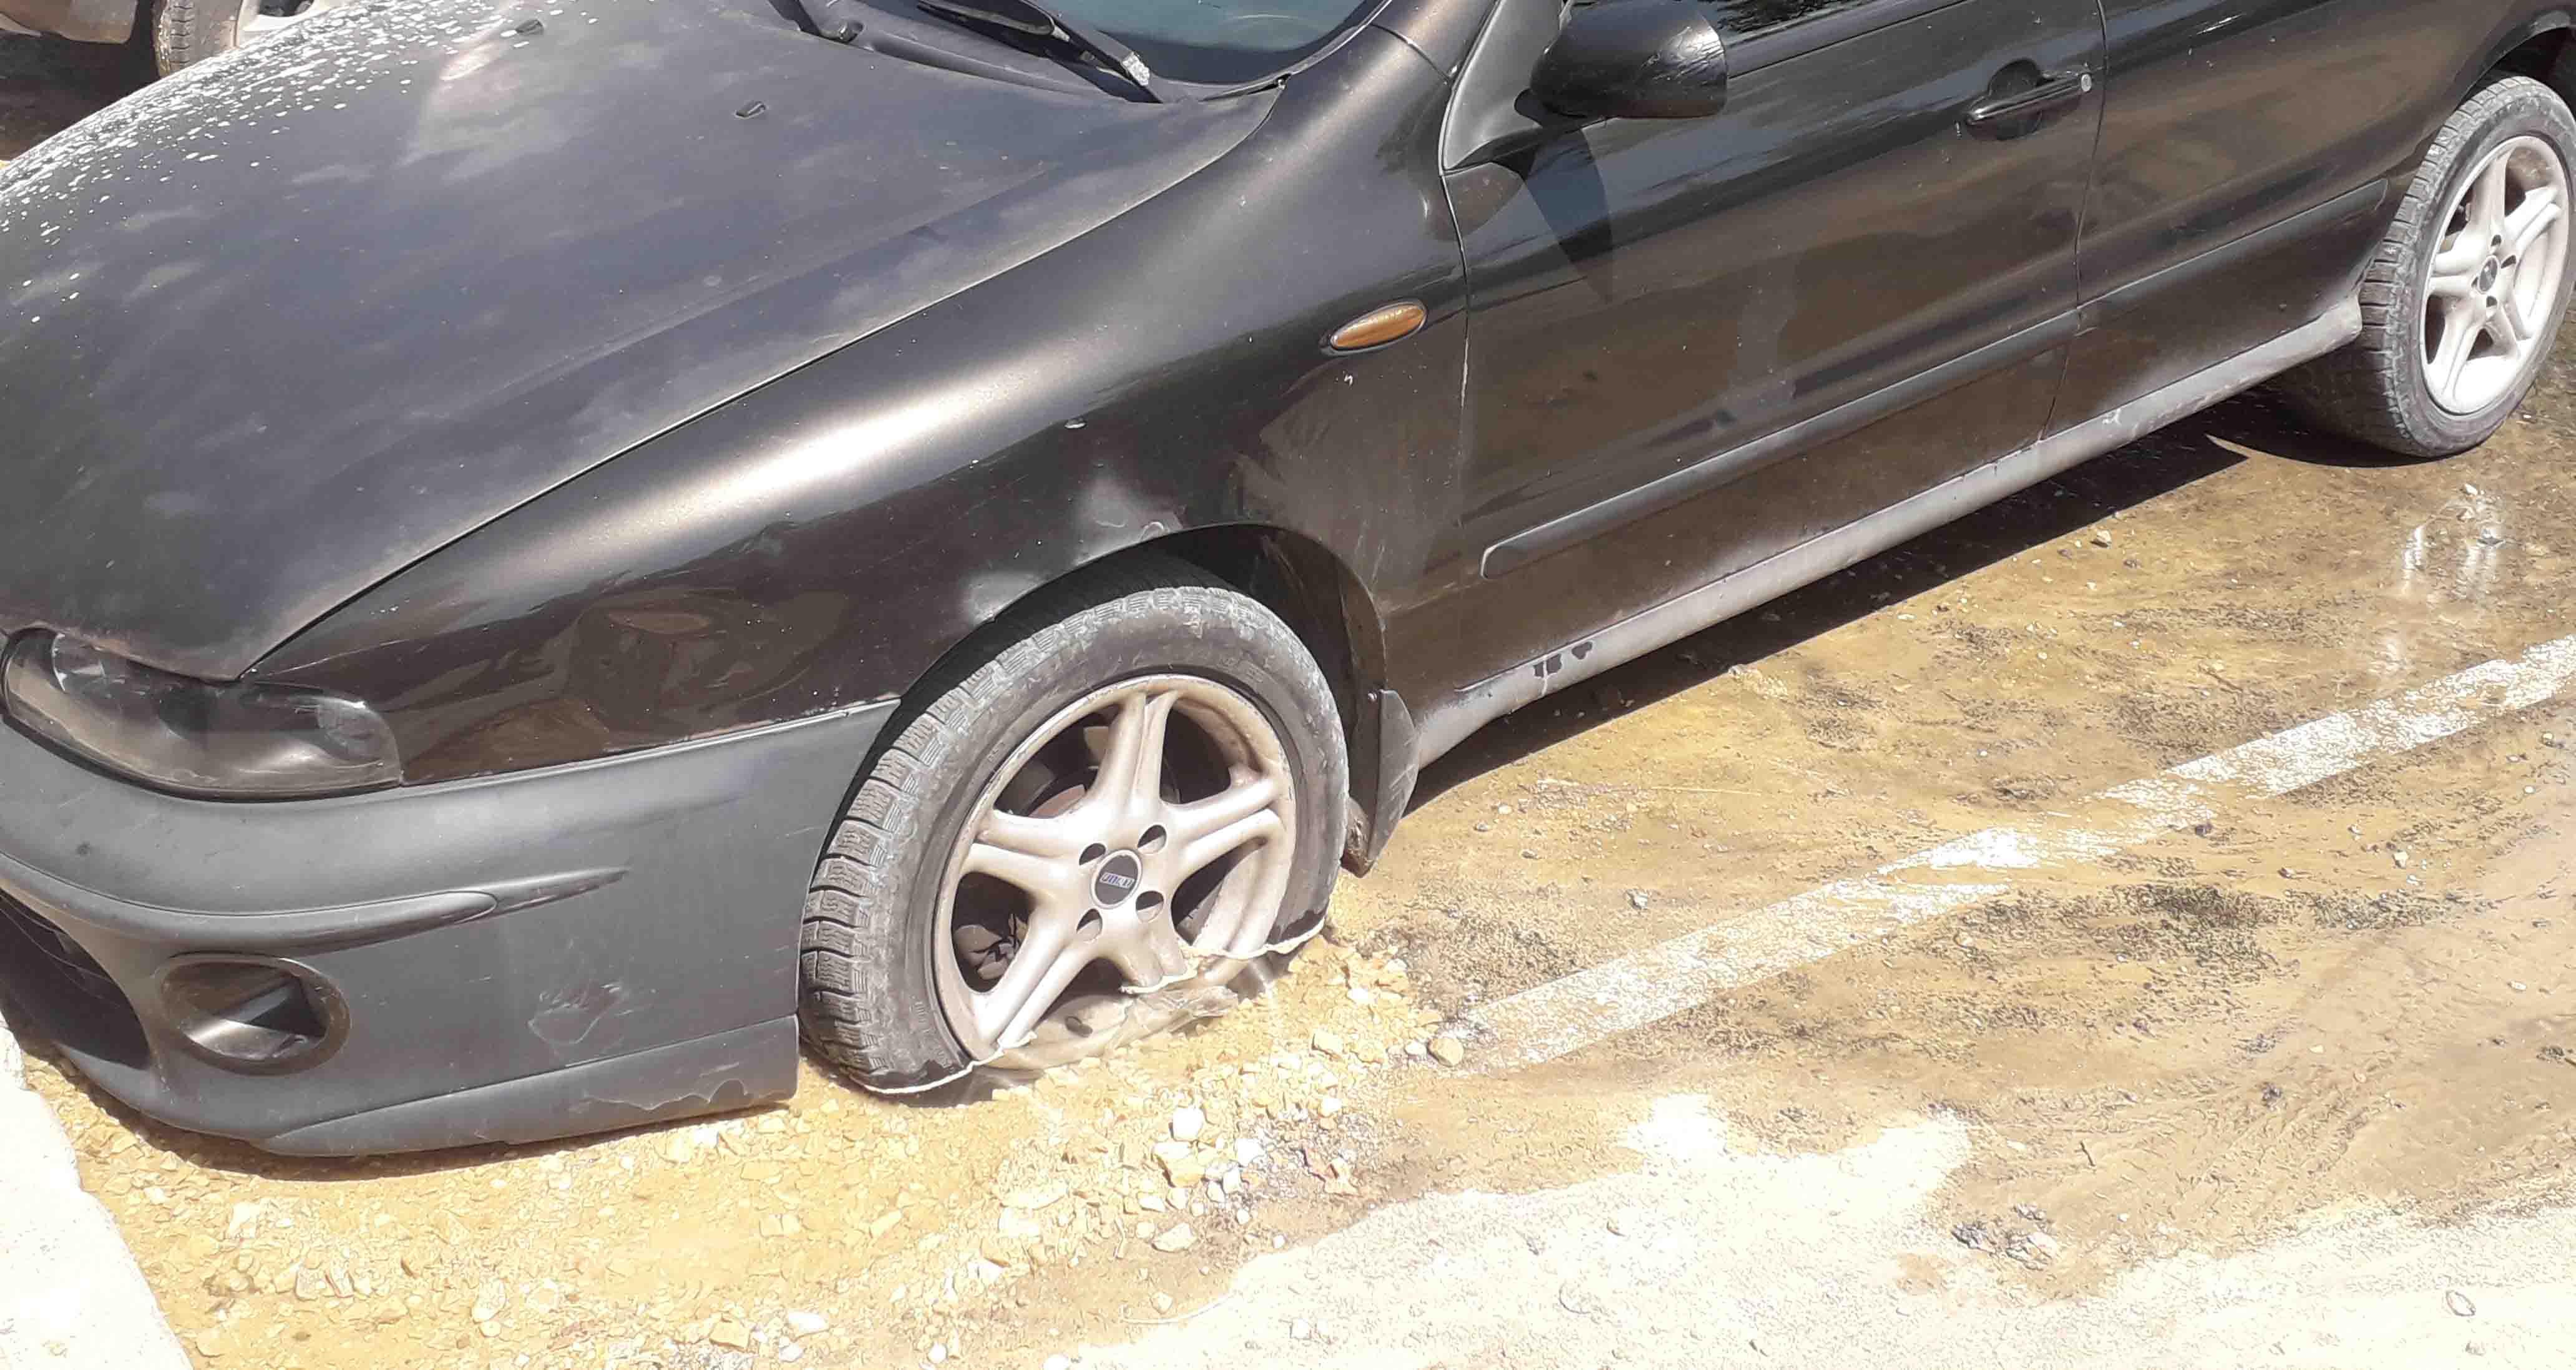 Народна странка Крагујевац: Власт СНС-а ни паркинг не зна да поправи, зна само да лаже народ